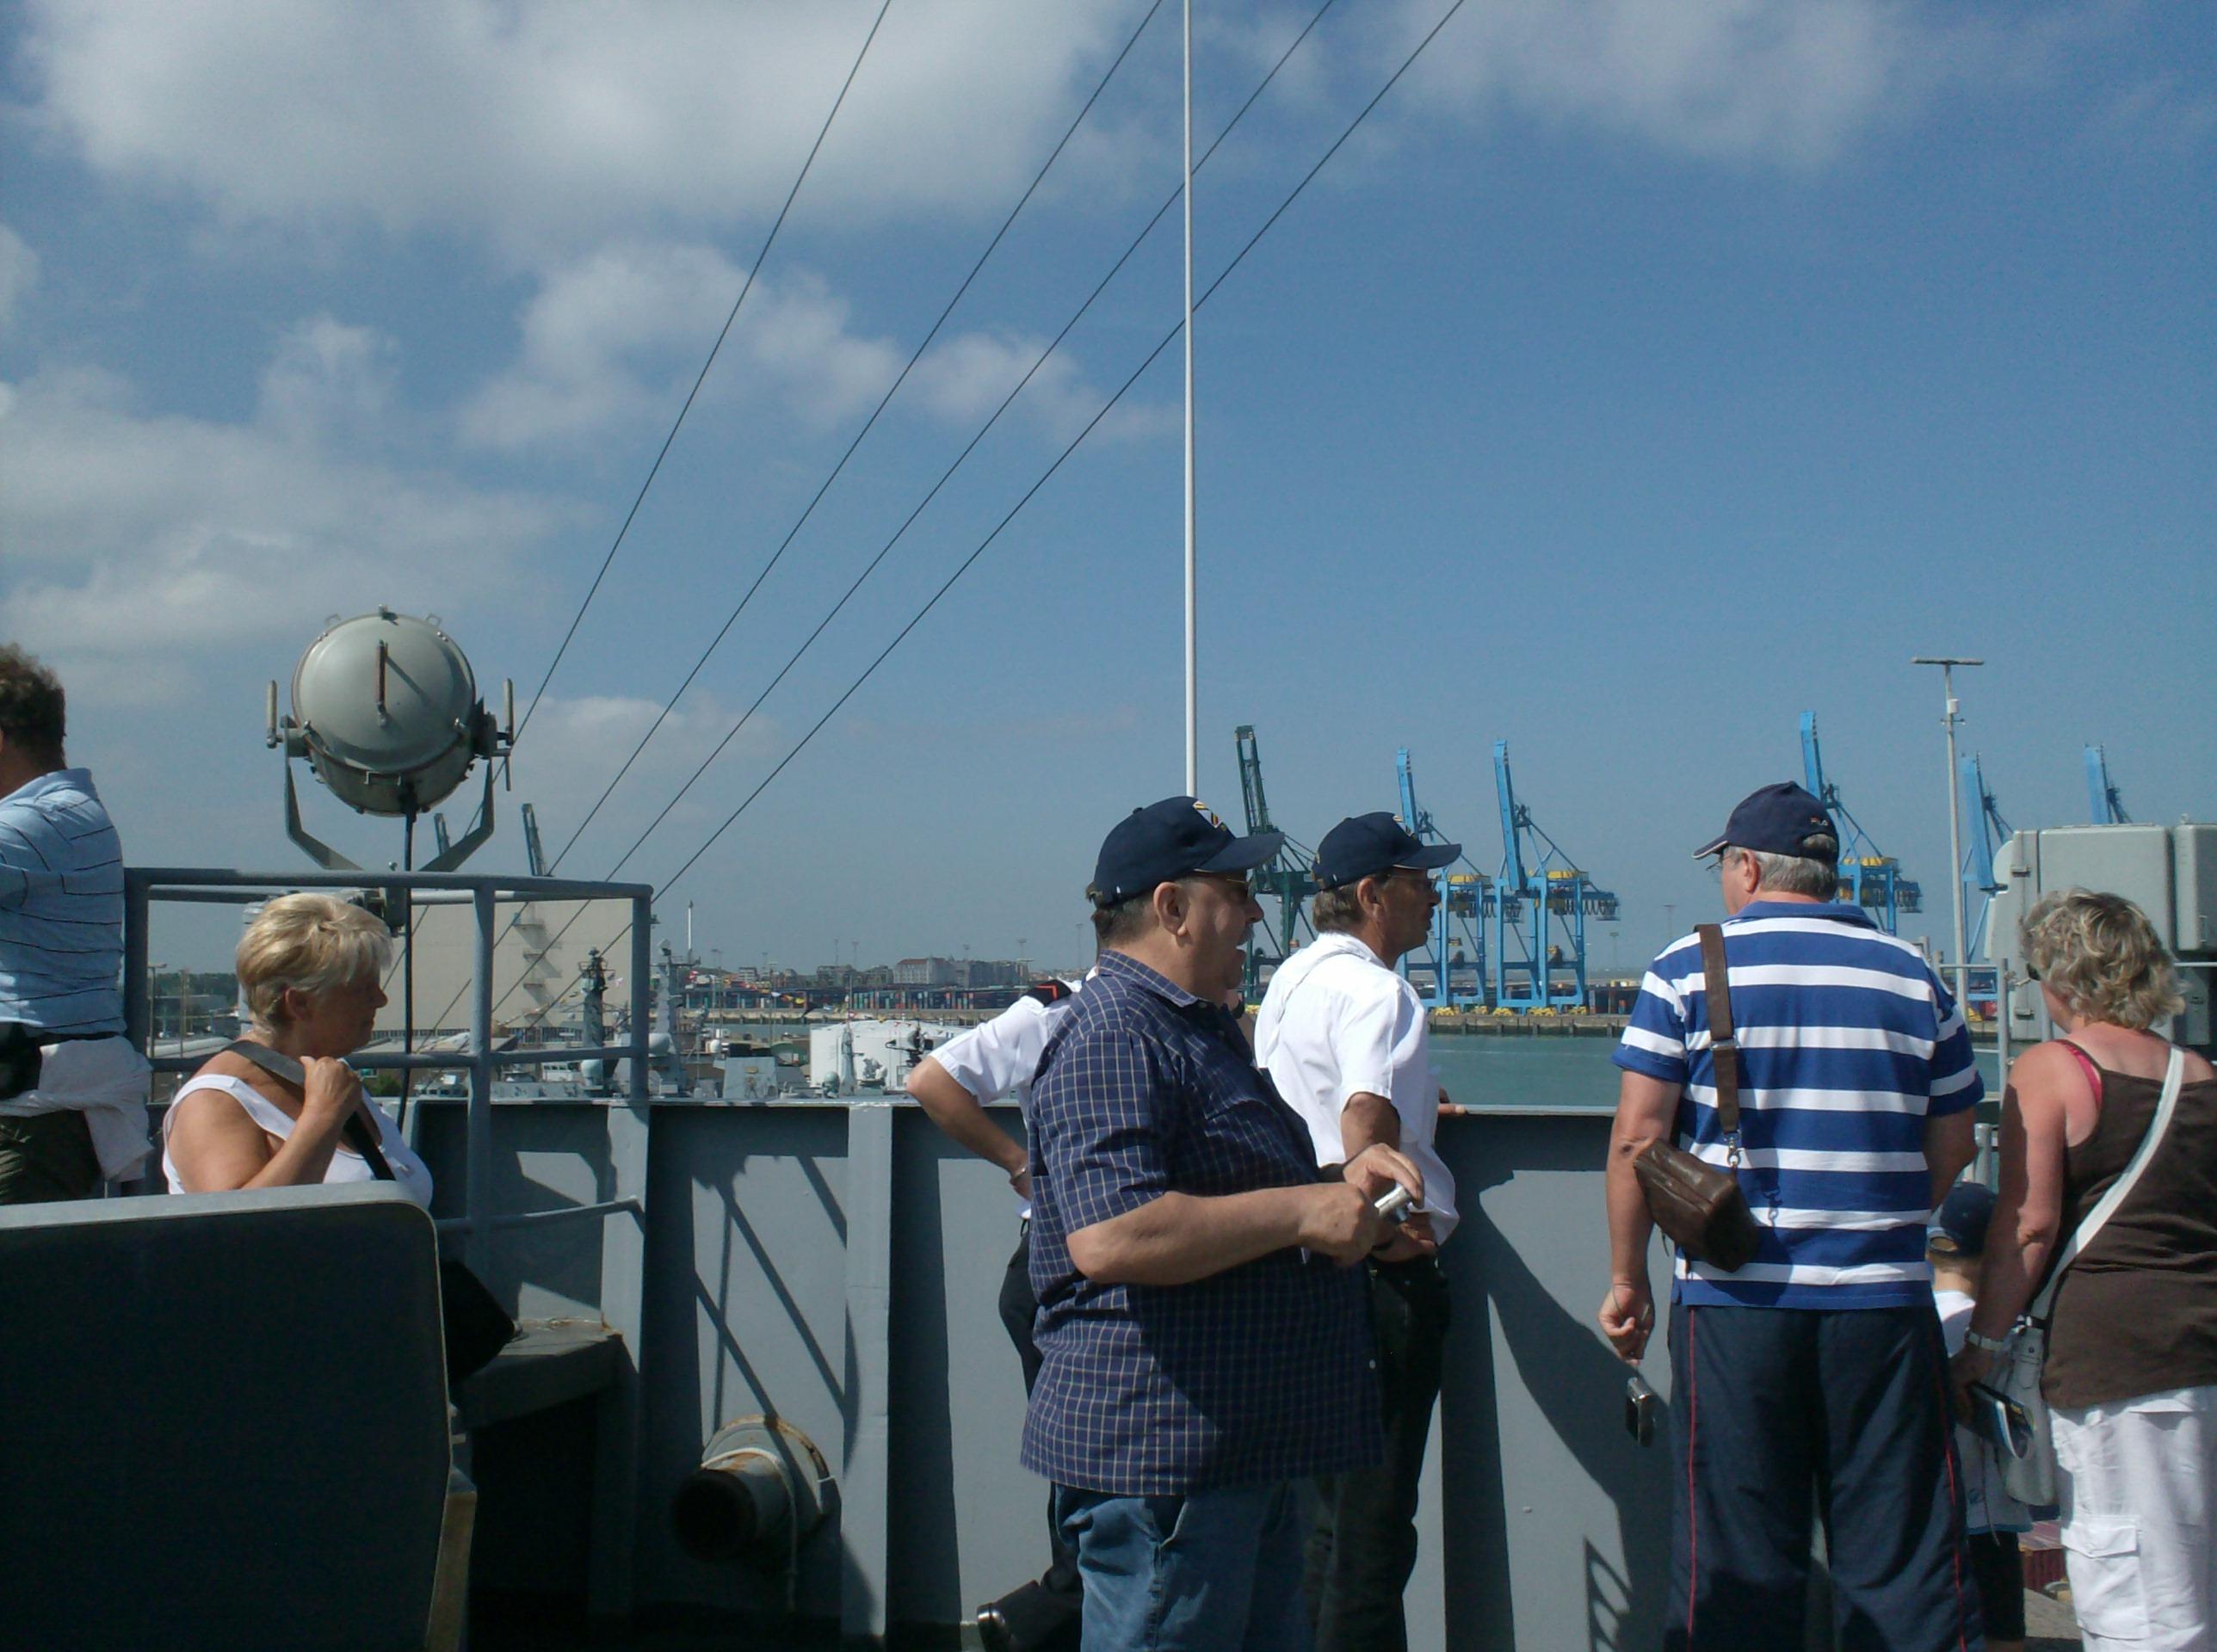 Vos photos du Navy Day 03&04/07/2010  - Page 2 225771HPIM1443